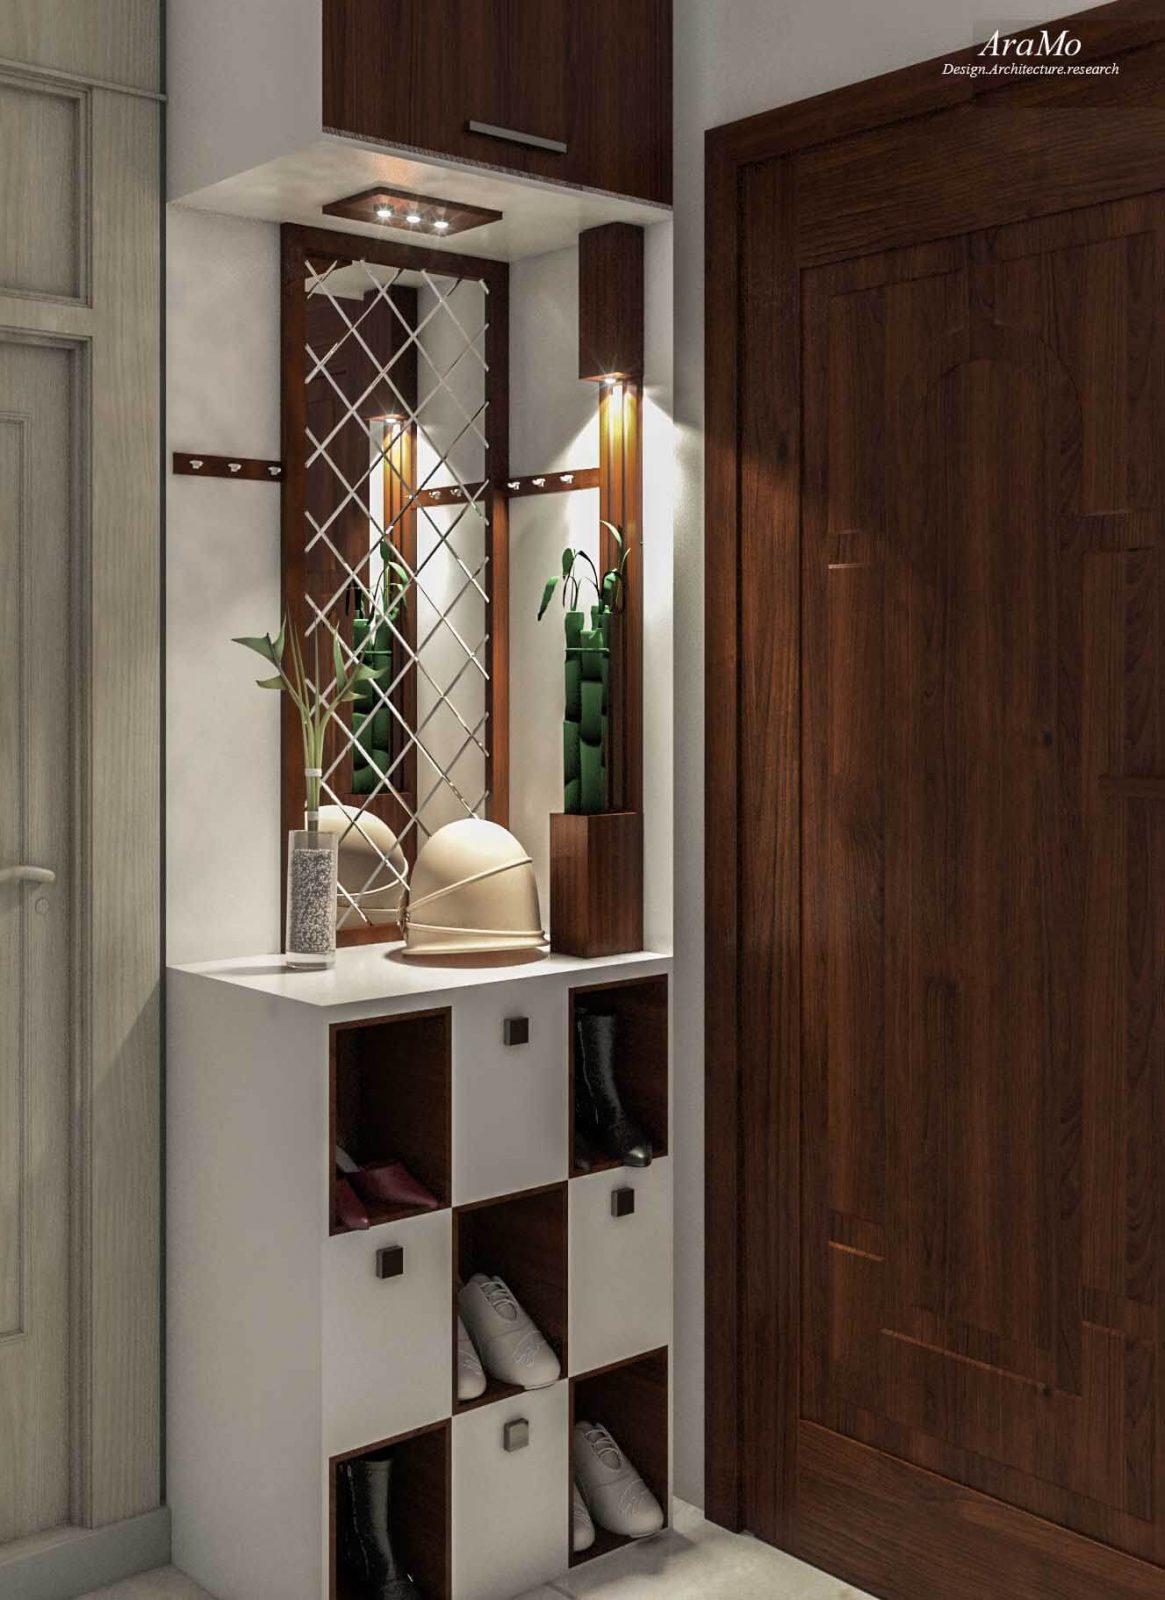 طراحی و دکوراسیون ورودی آپارتمان